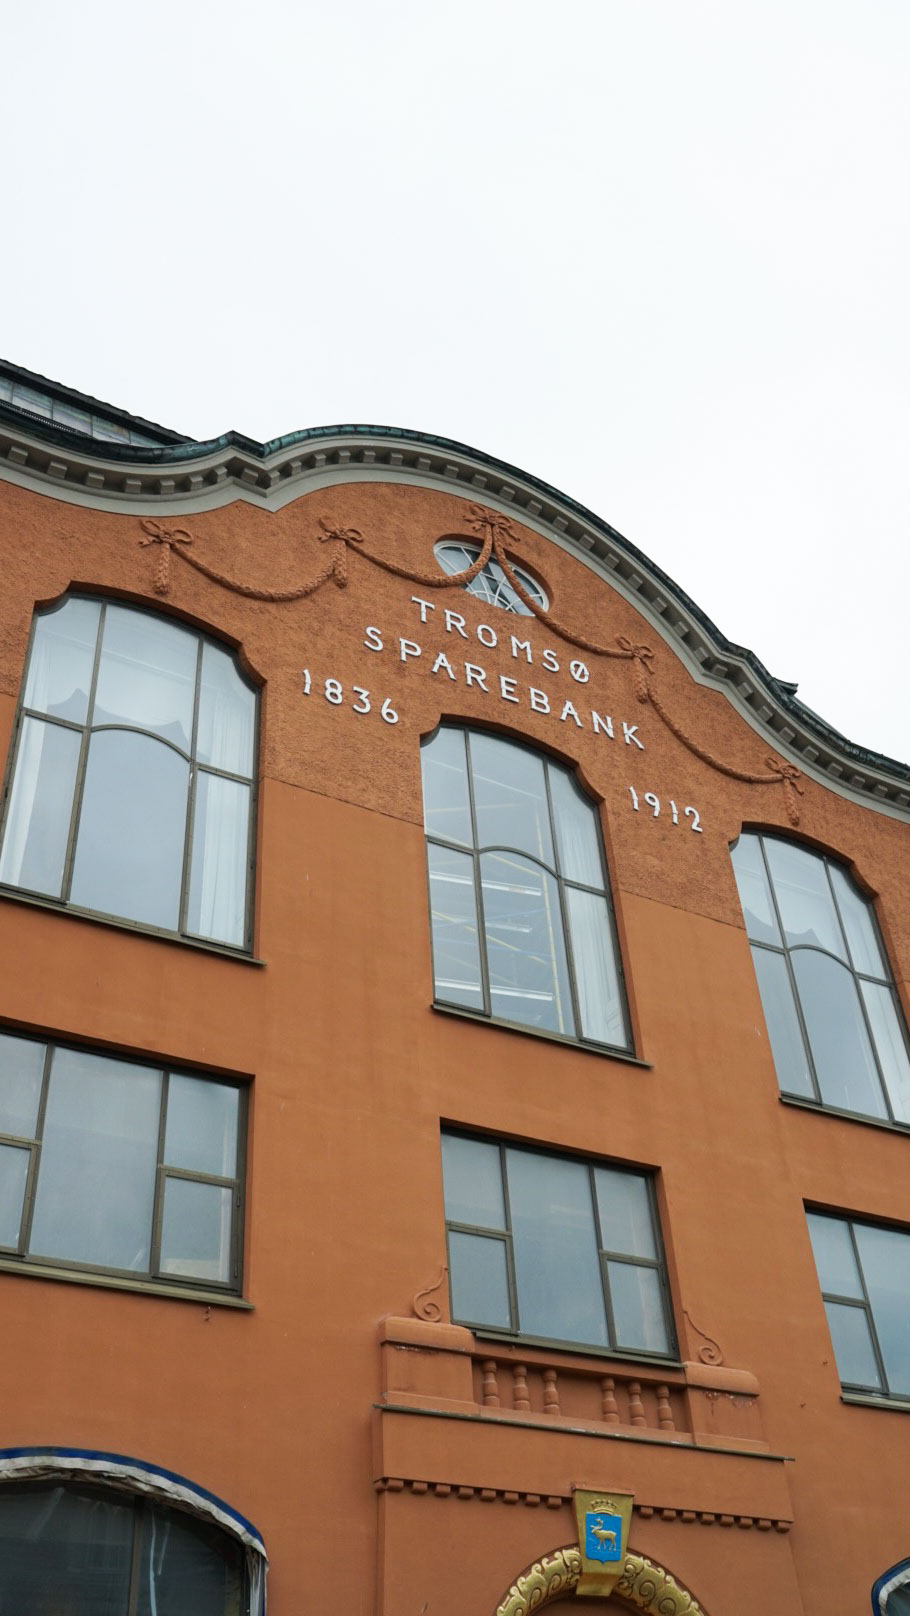 Vanha pankkirakennus Tromssassa